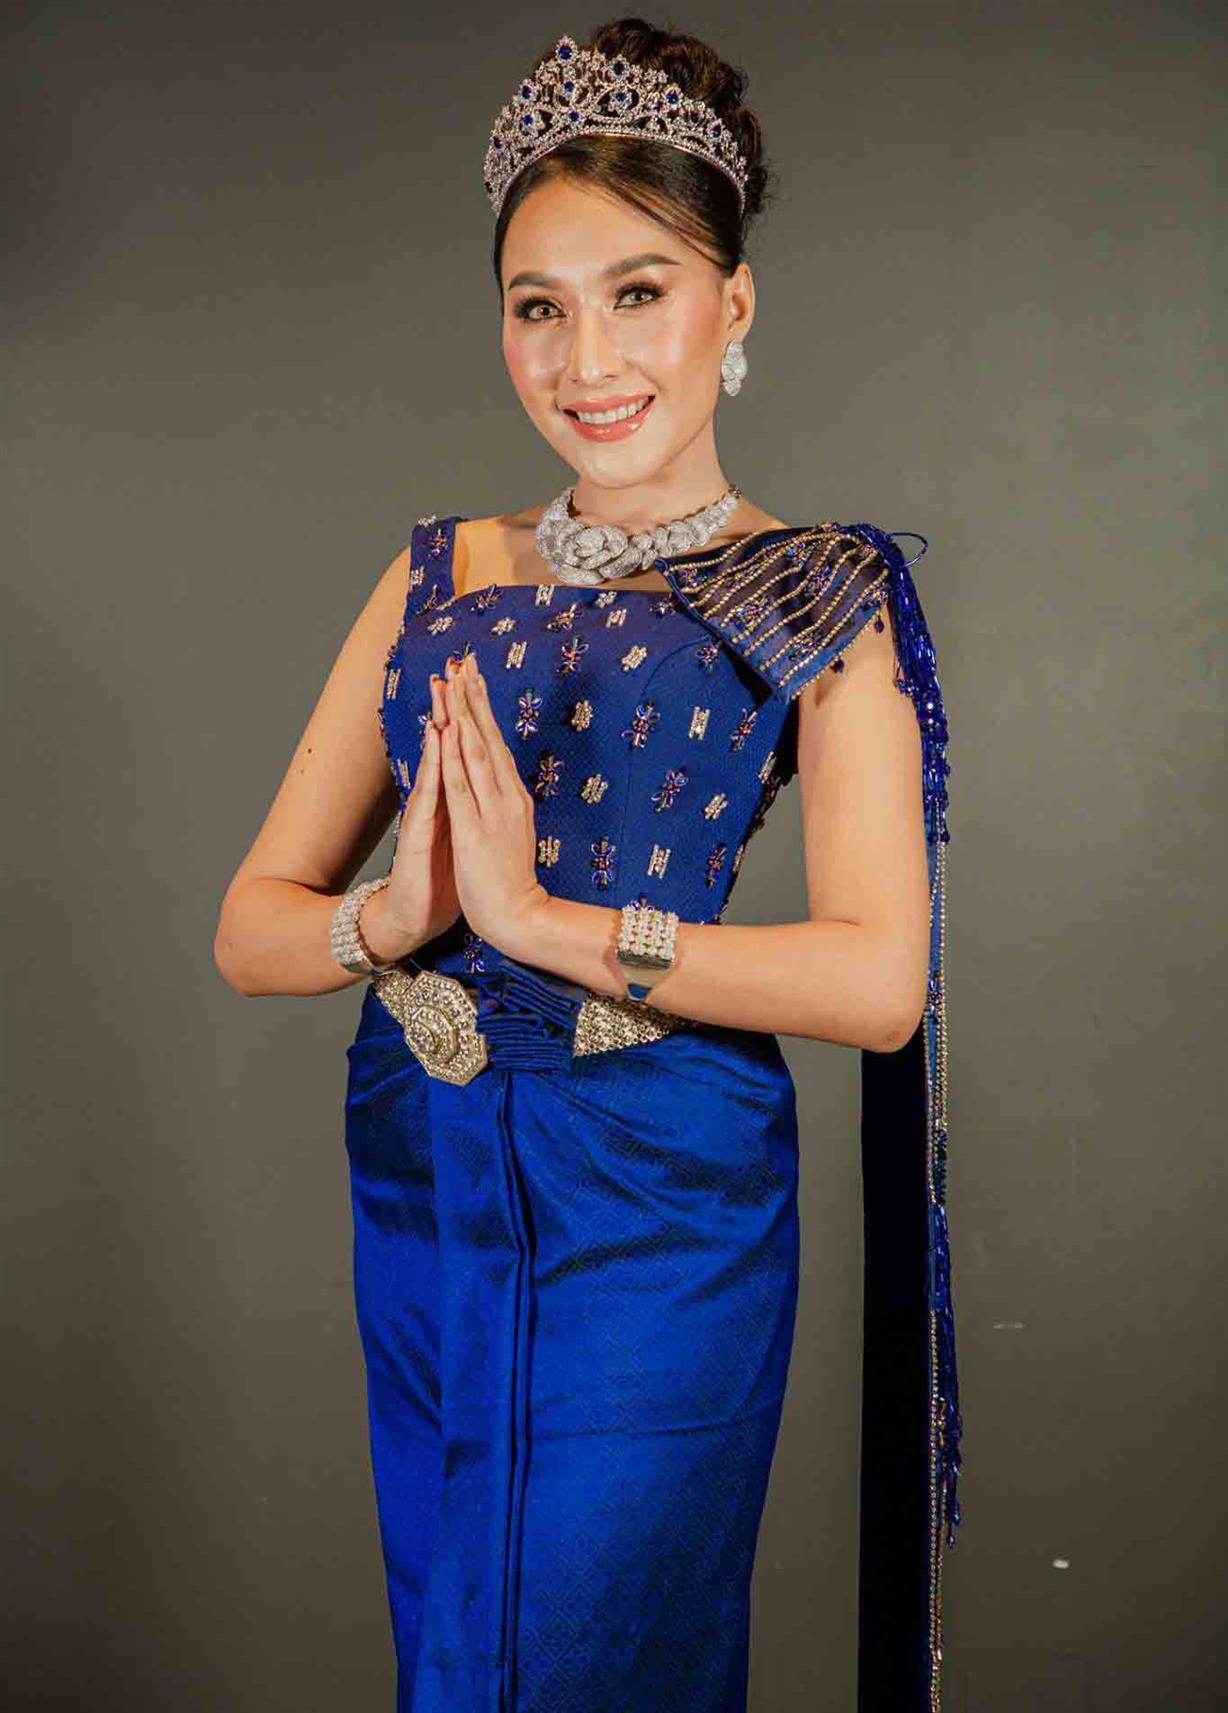 Miss Grand Tboung Khmom 2020 Sal Chandalin